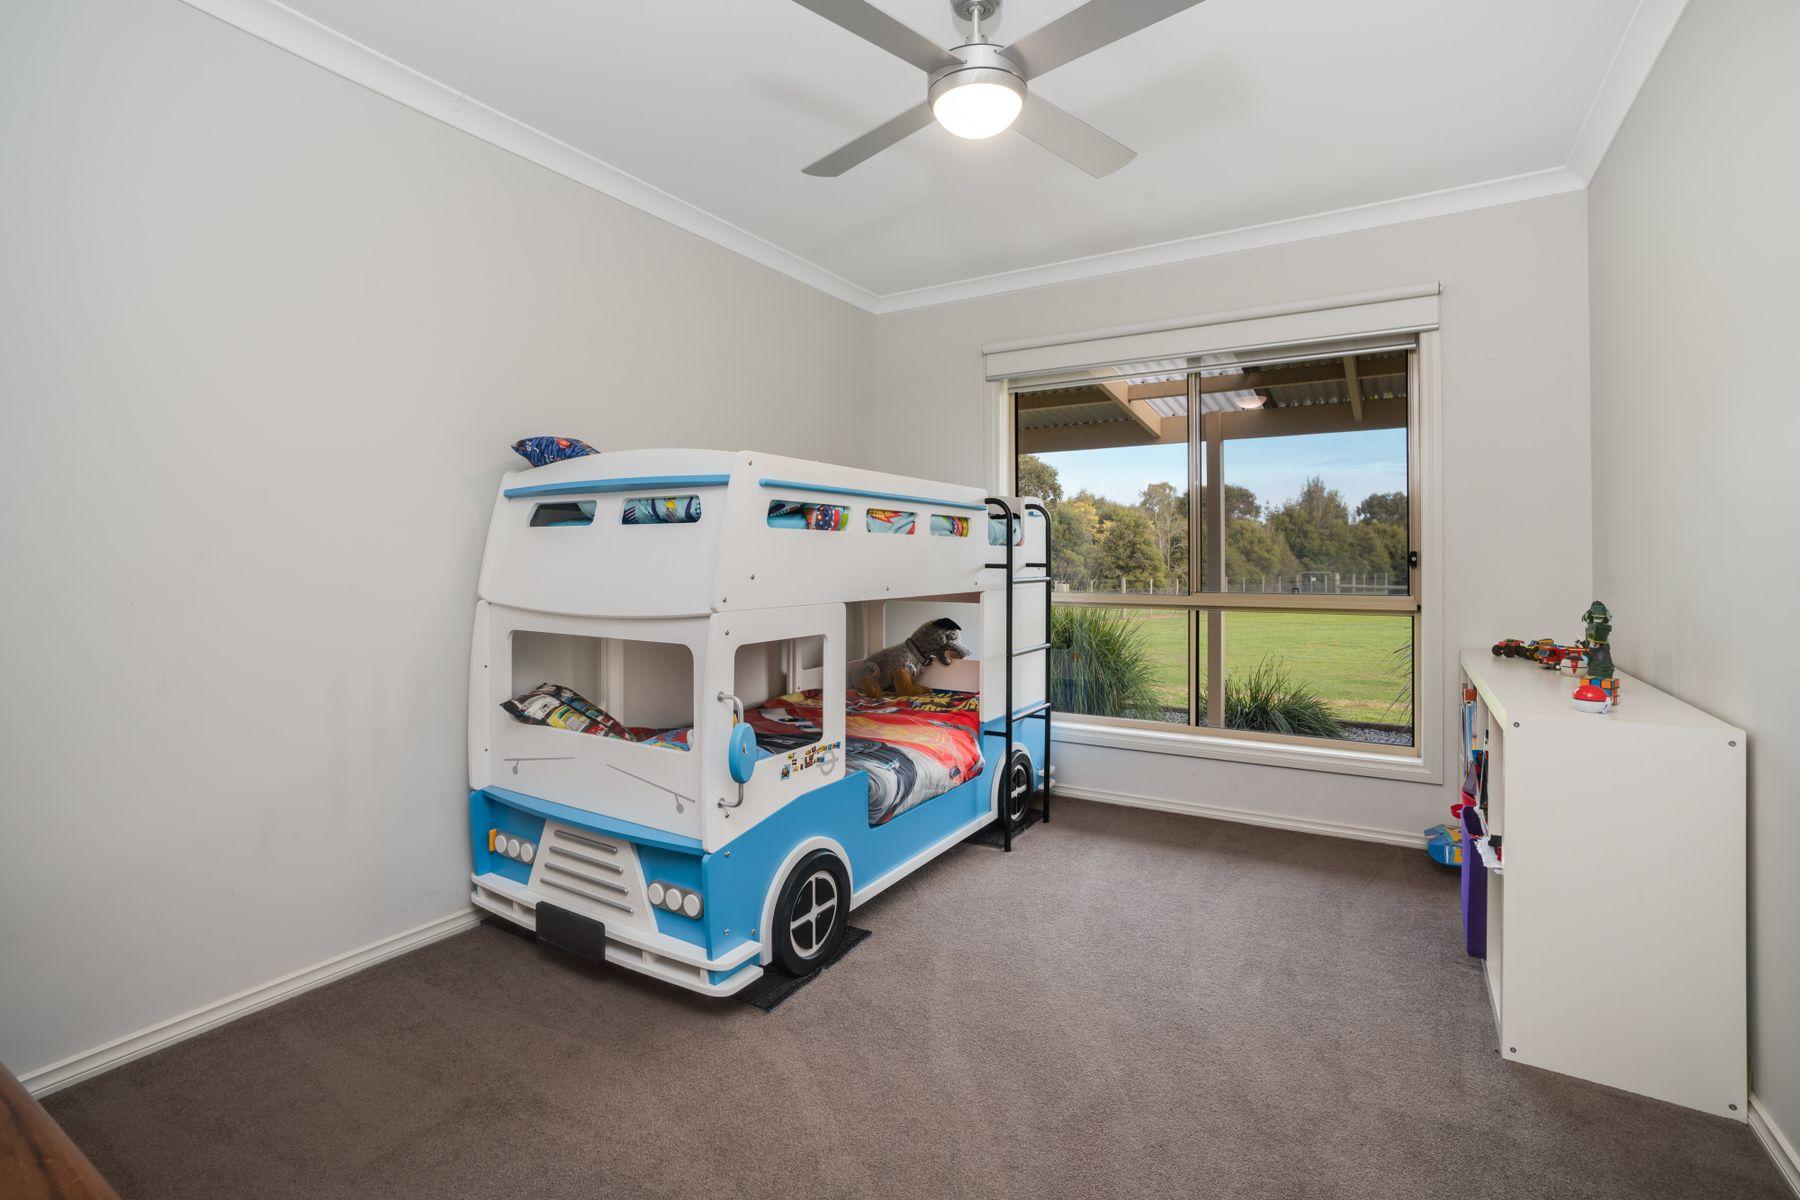 39 Merino Drive, Teesdale, VIC 3328